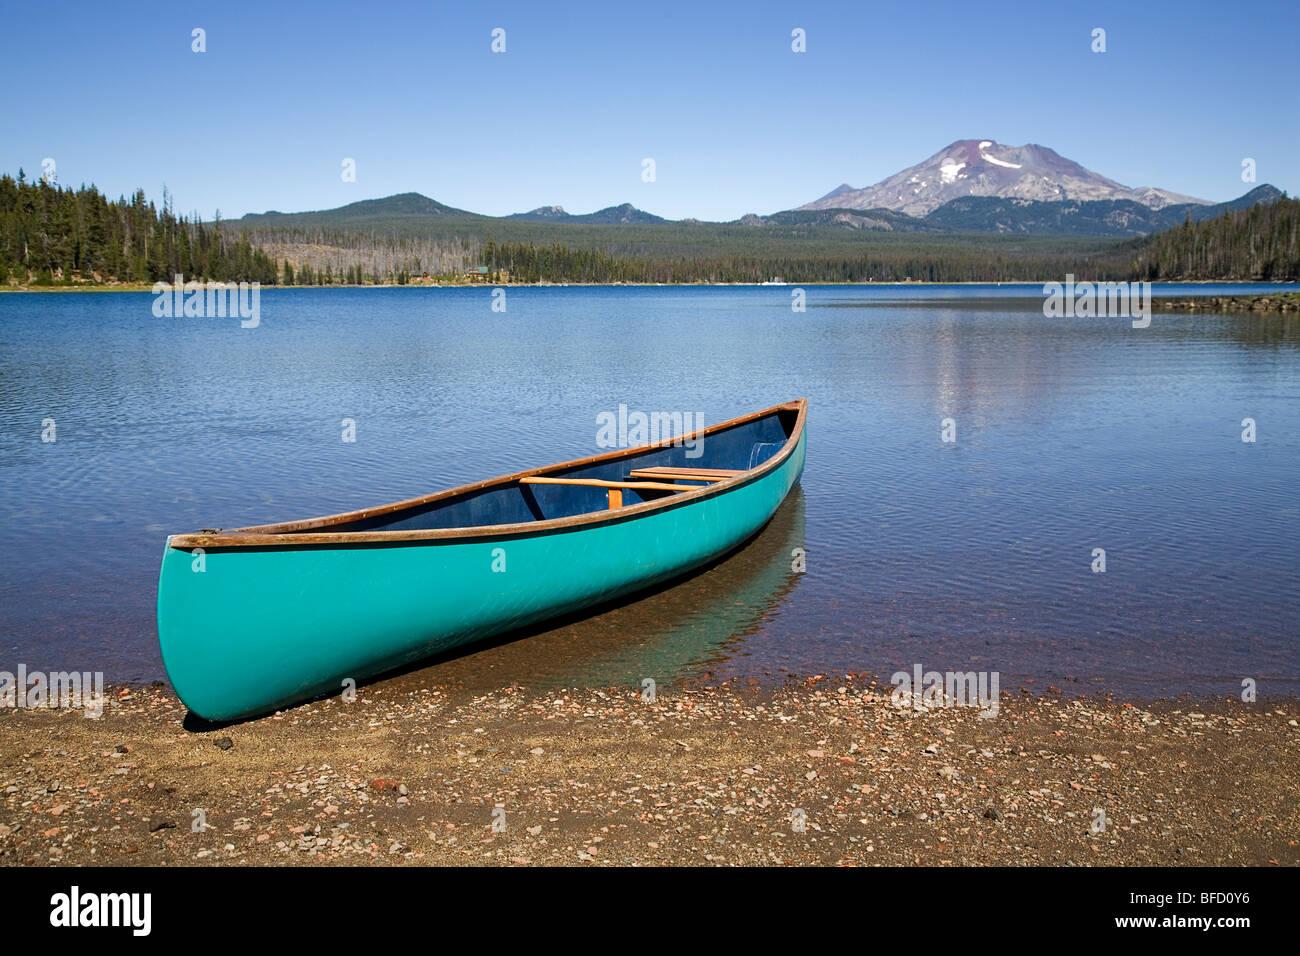 A canoe on the shore of a mountain lake in the Oregon Cascade Mountains along the Cascade Lakes Highway - Stock Image